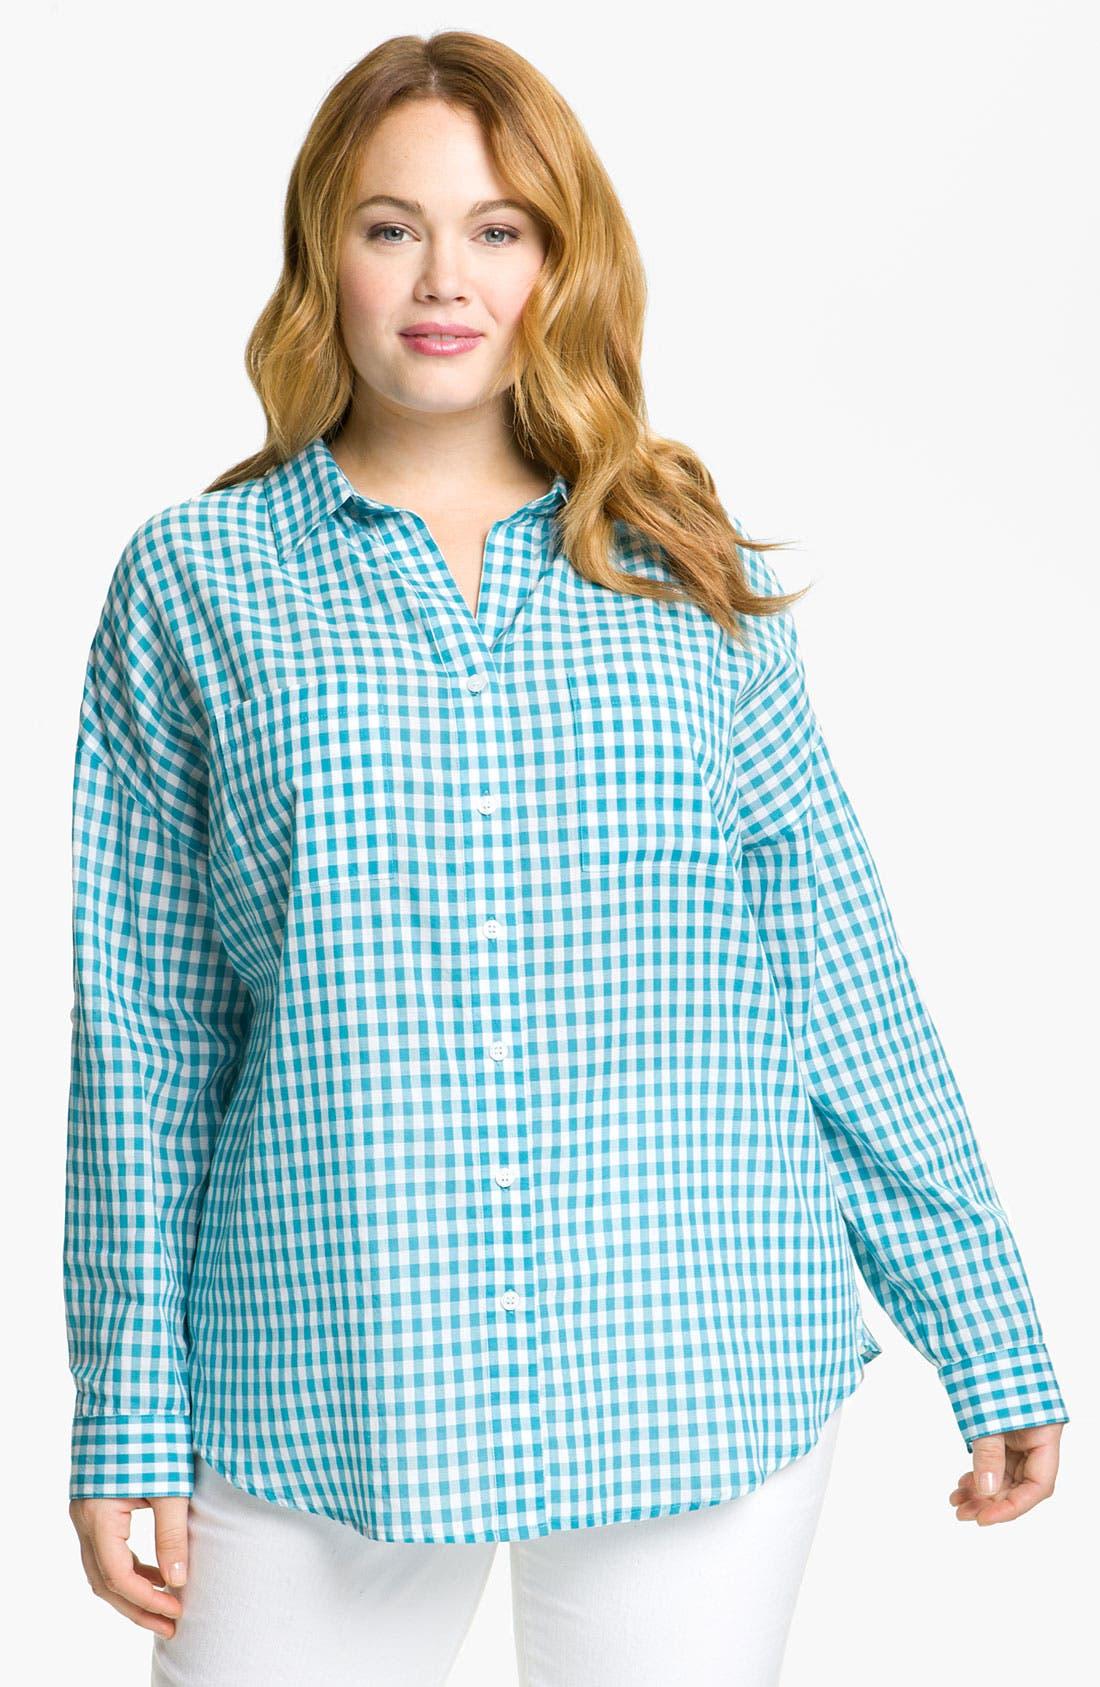 Alternate Image 1 Selected - Sandra Ingrish Gingham Check Shirt (Plus)